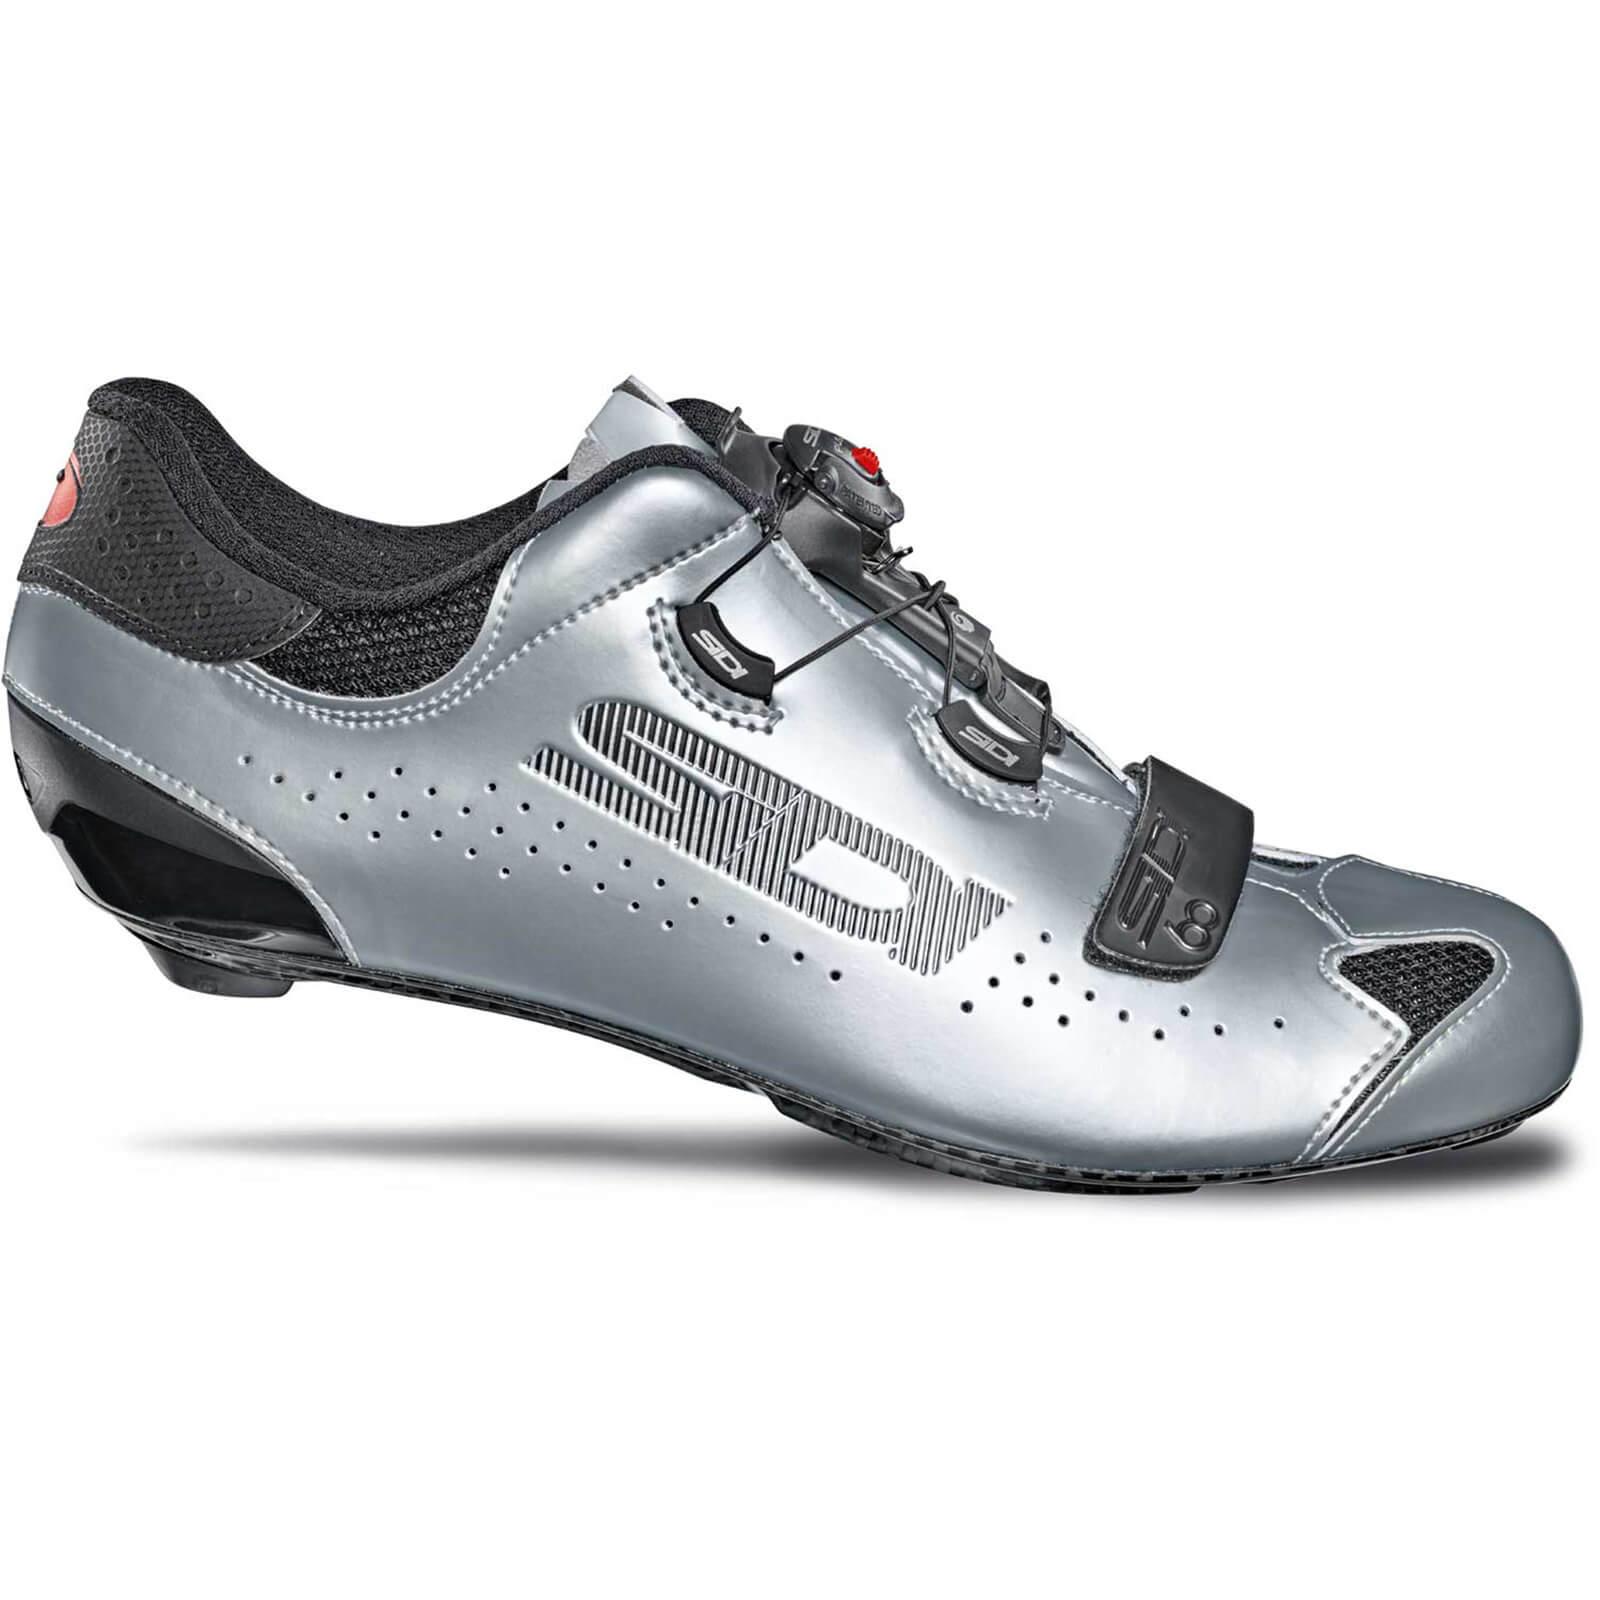 Sidi Sixty Limited Edition Carbon Road Shoes - EU 42